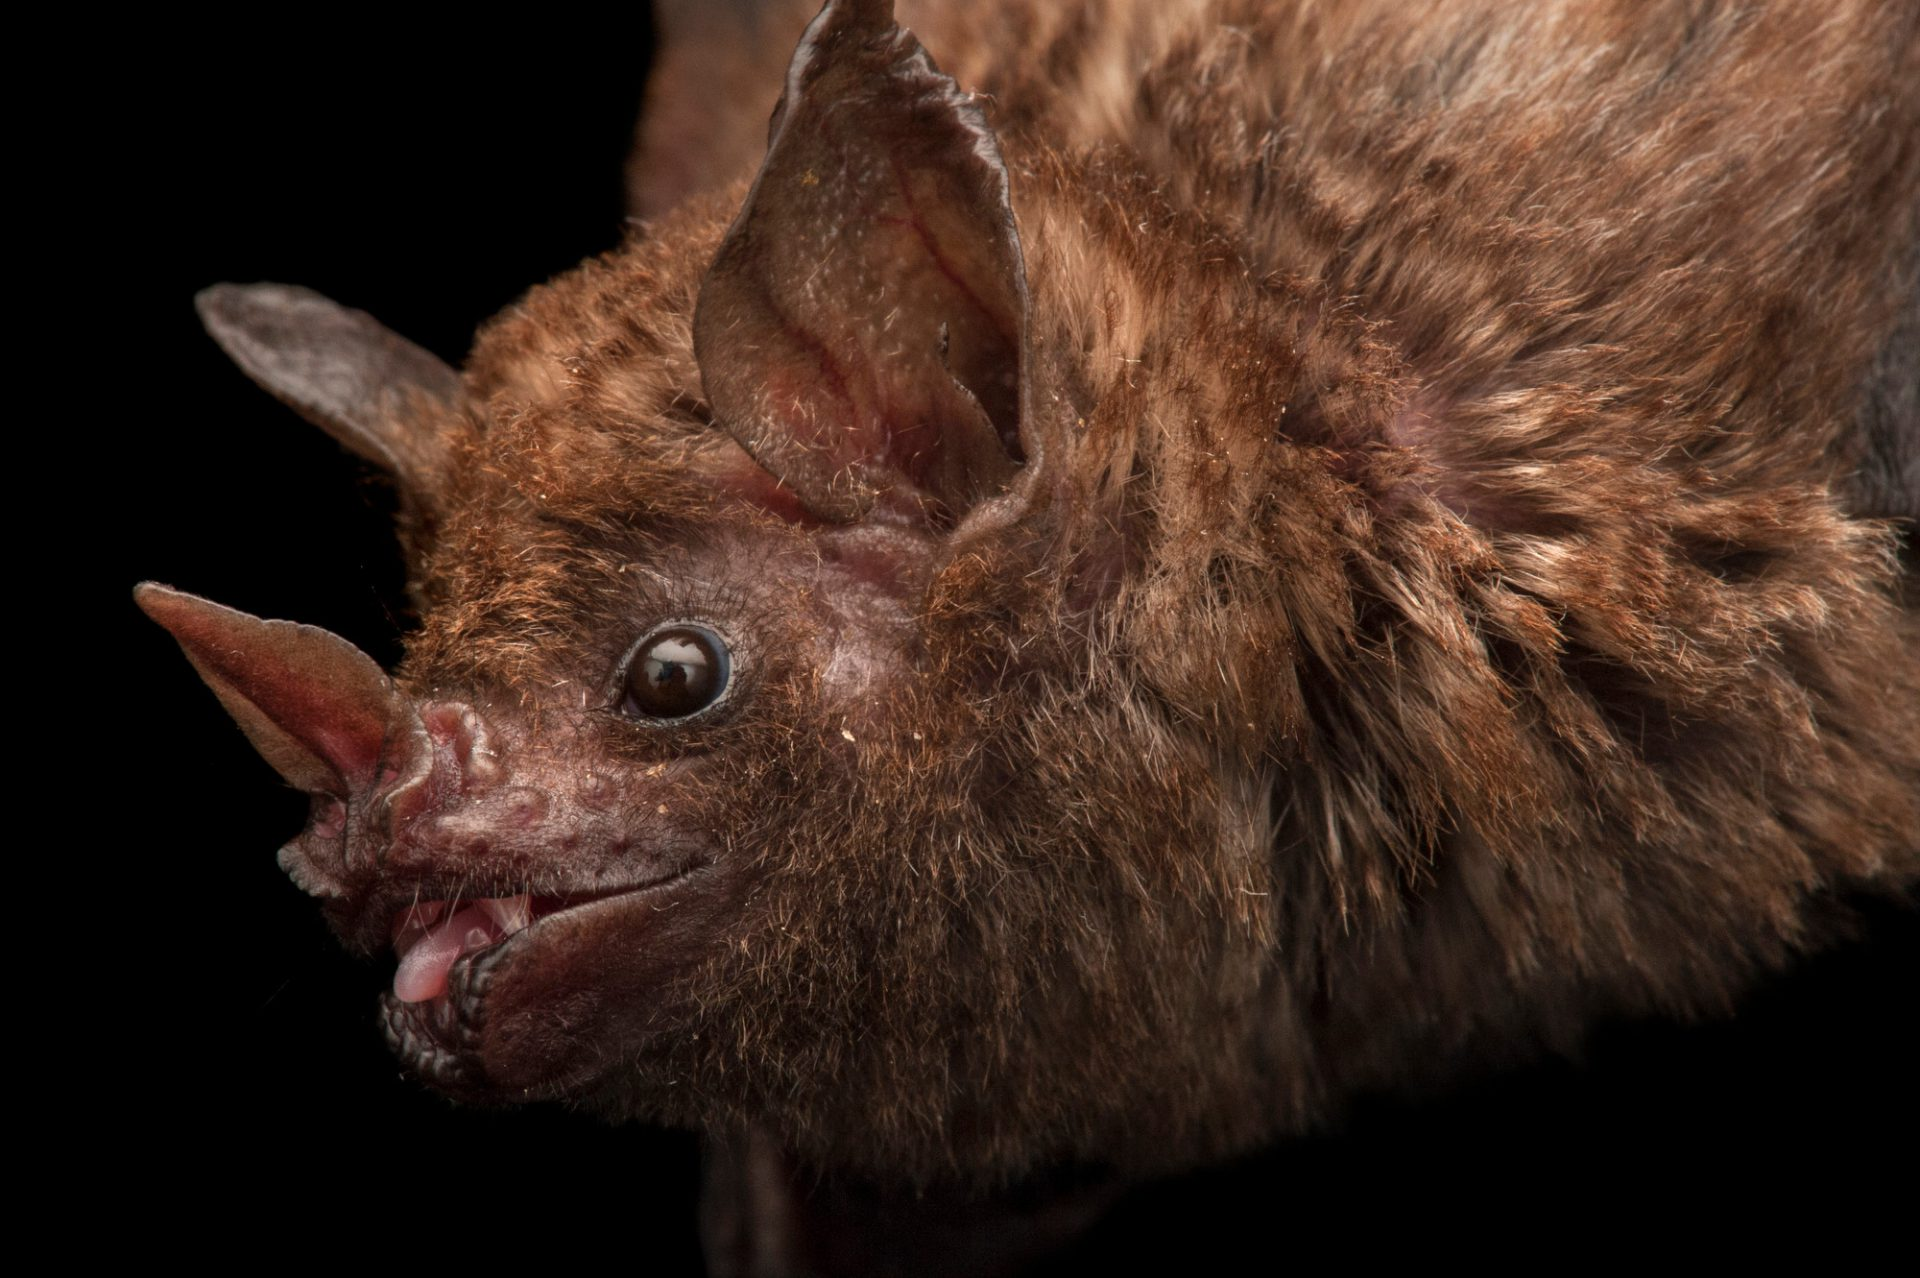 Seba short-tailed fruit bat (Carollia perspicillata) at the Lincoln Children's Zoo